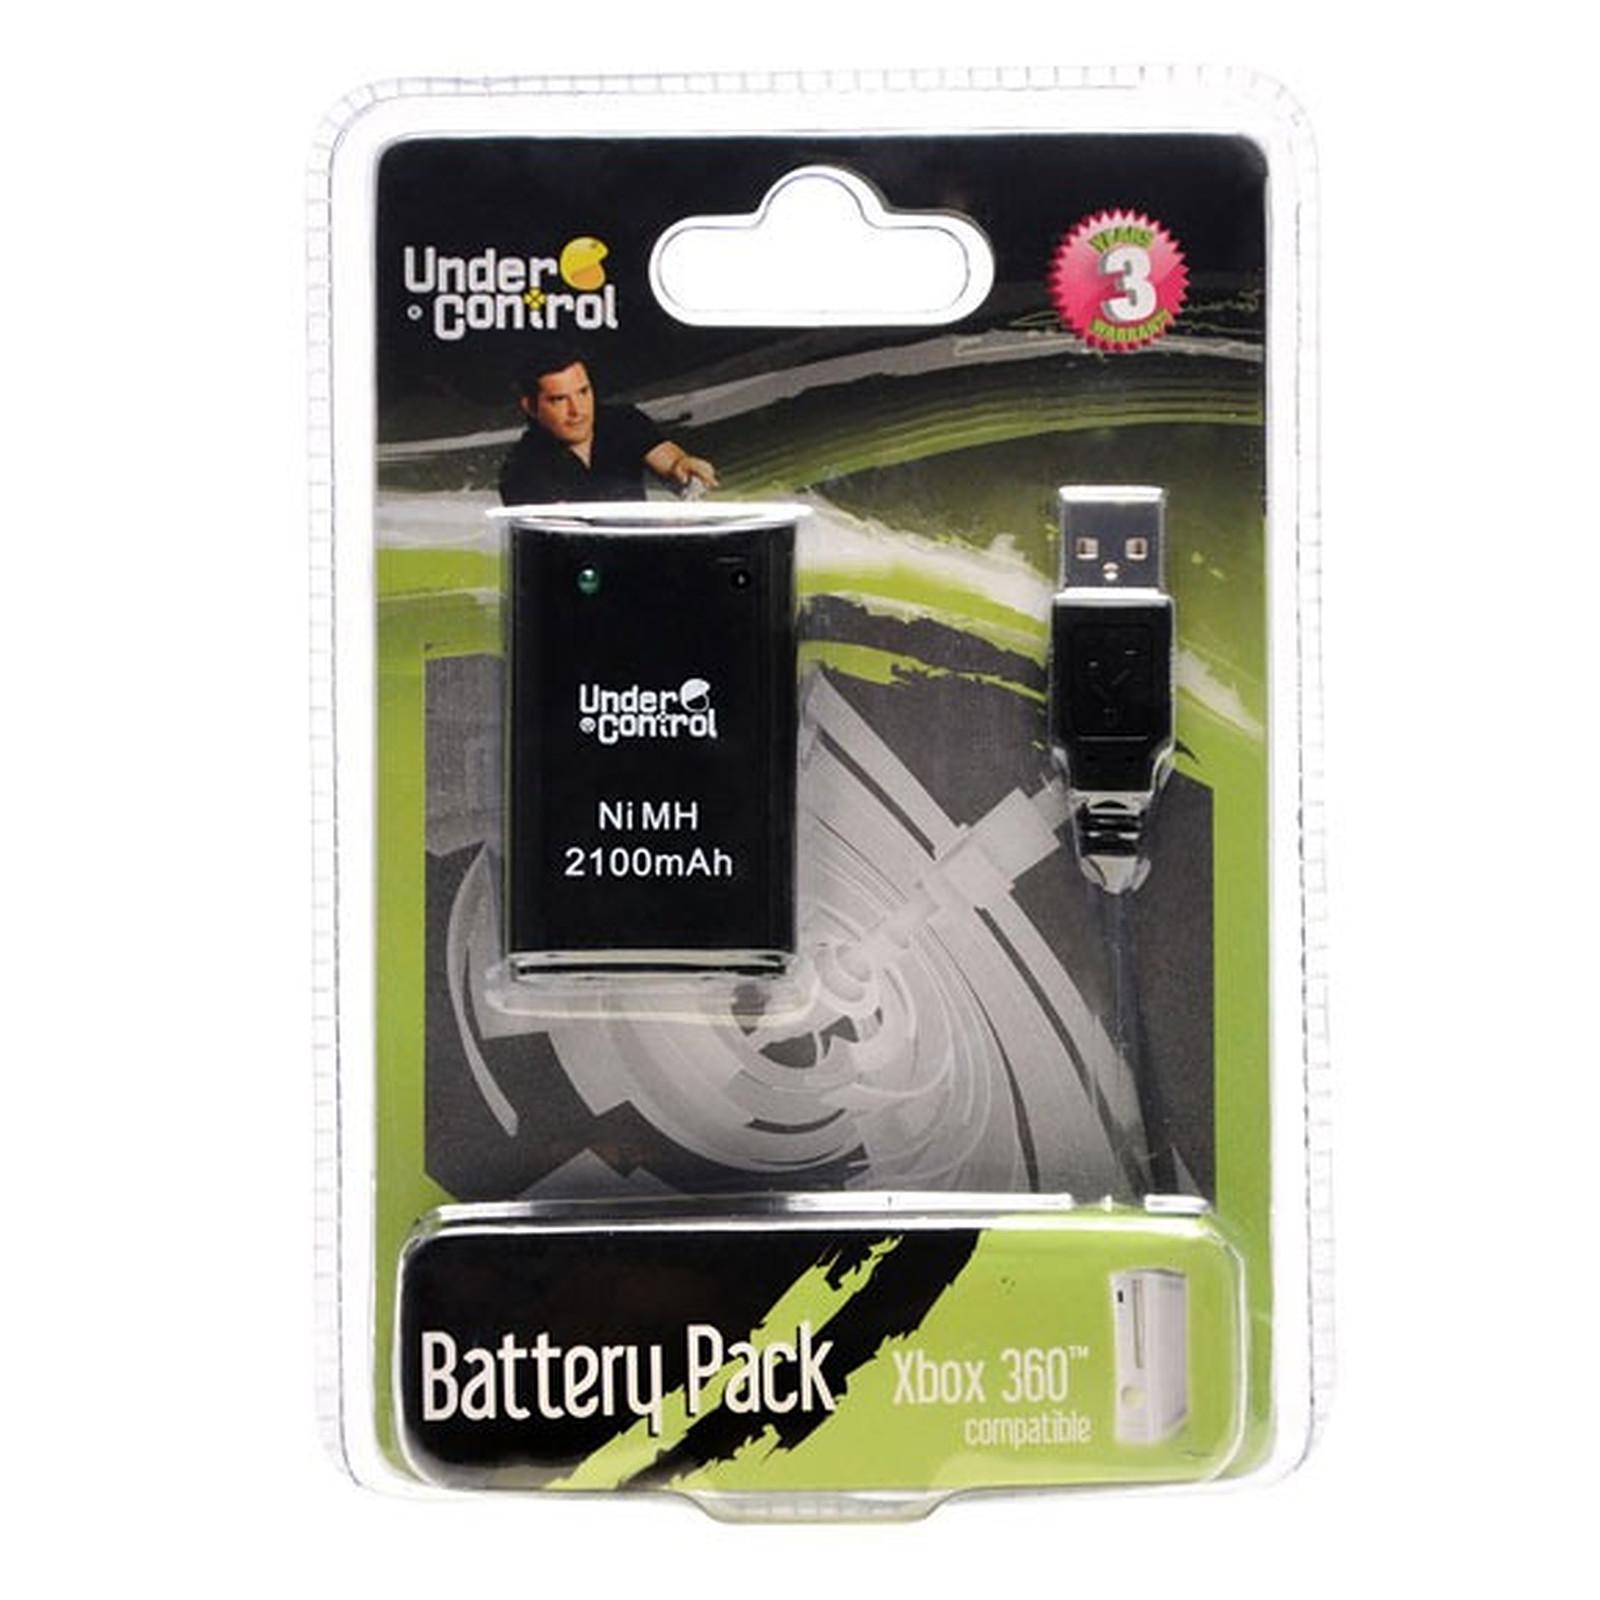 Under Control Battery Pack Noir (Xbox 360)